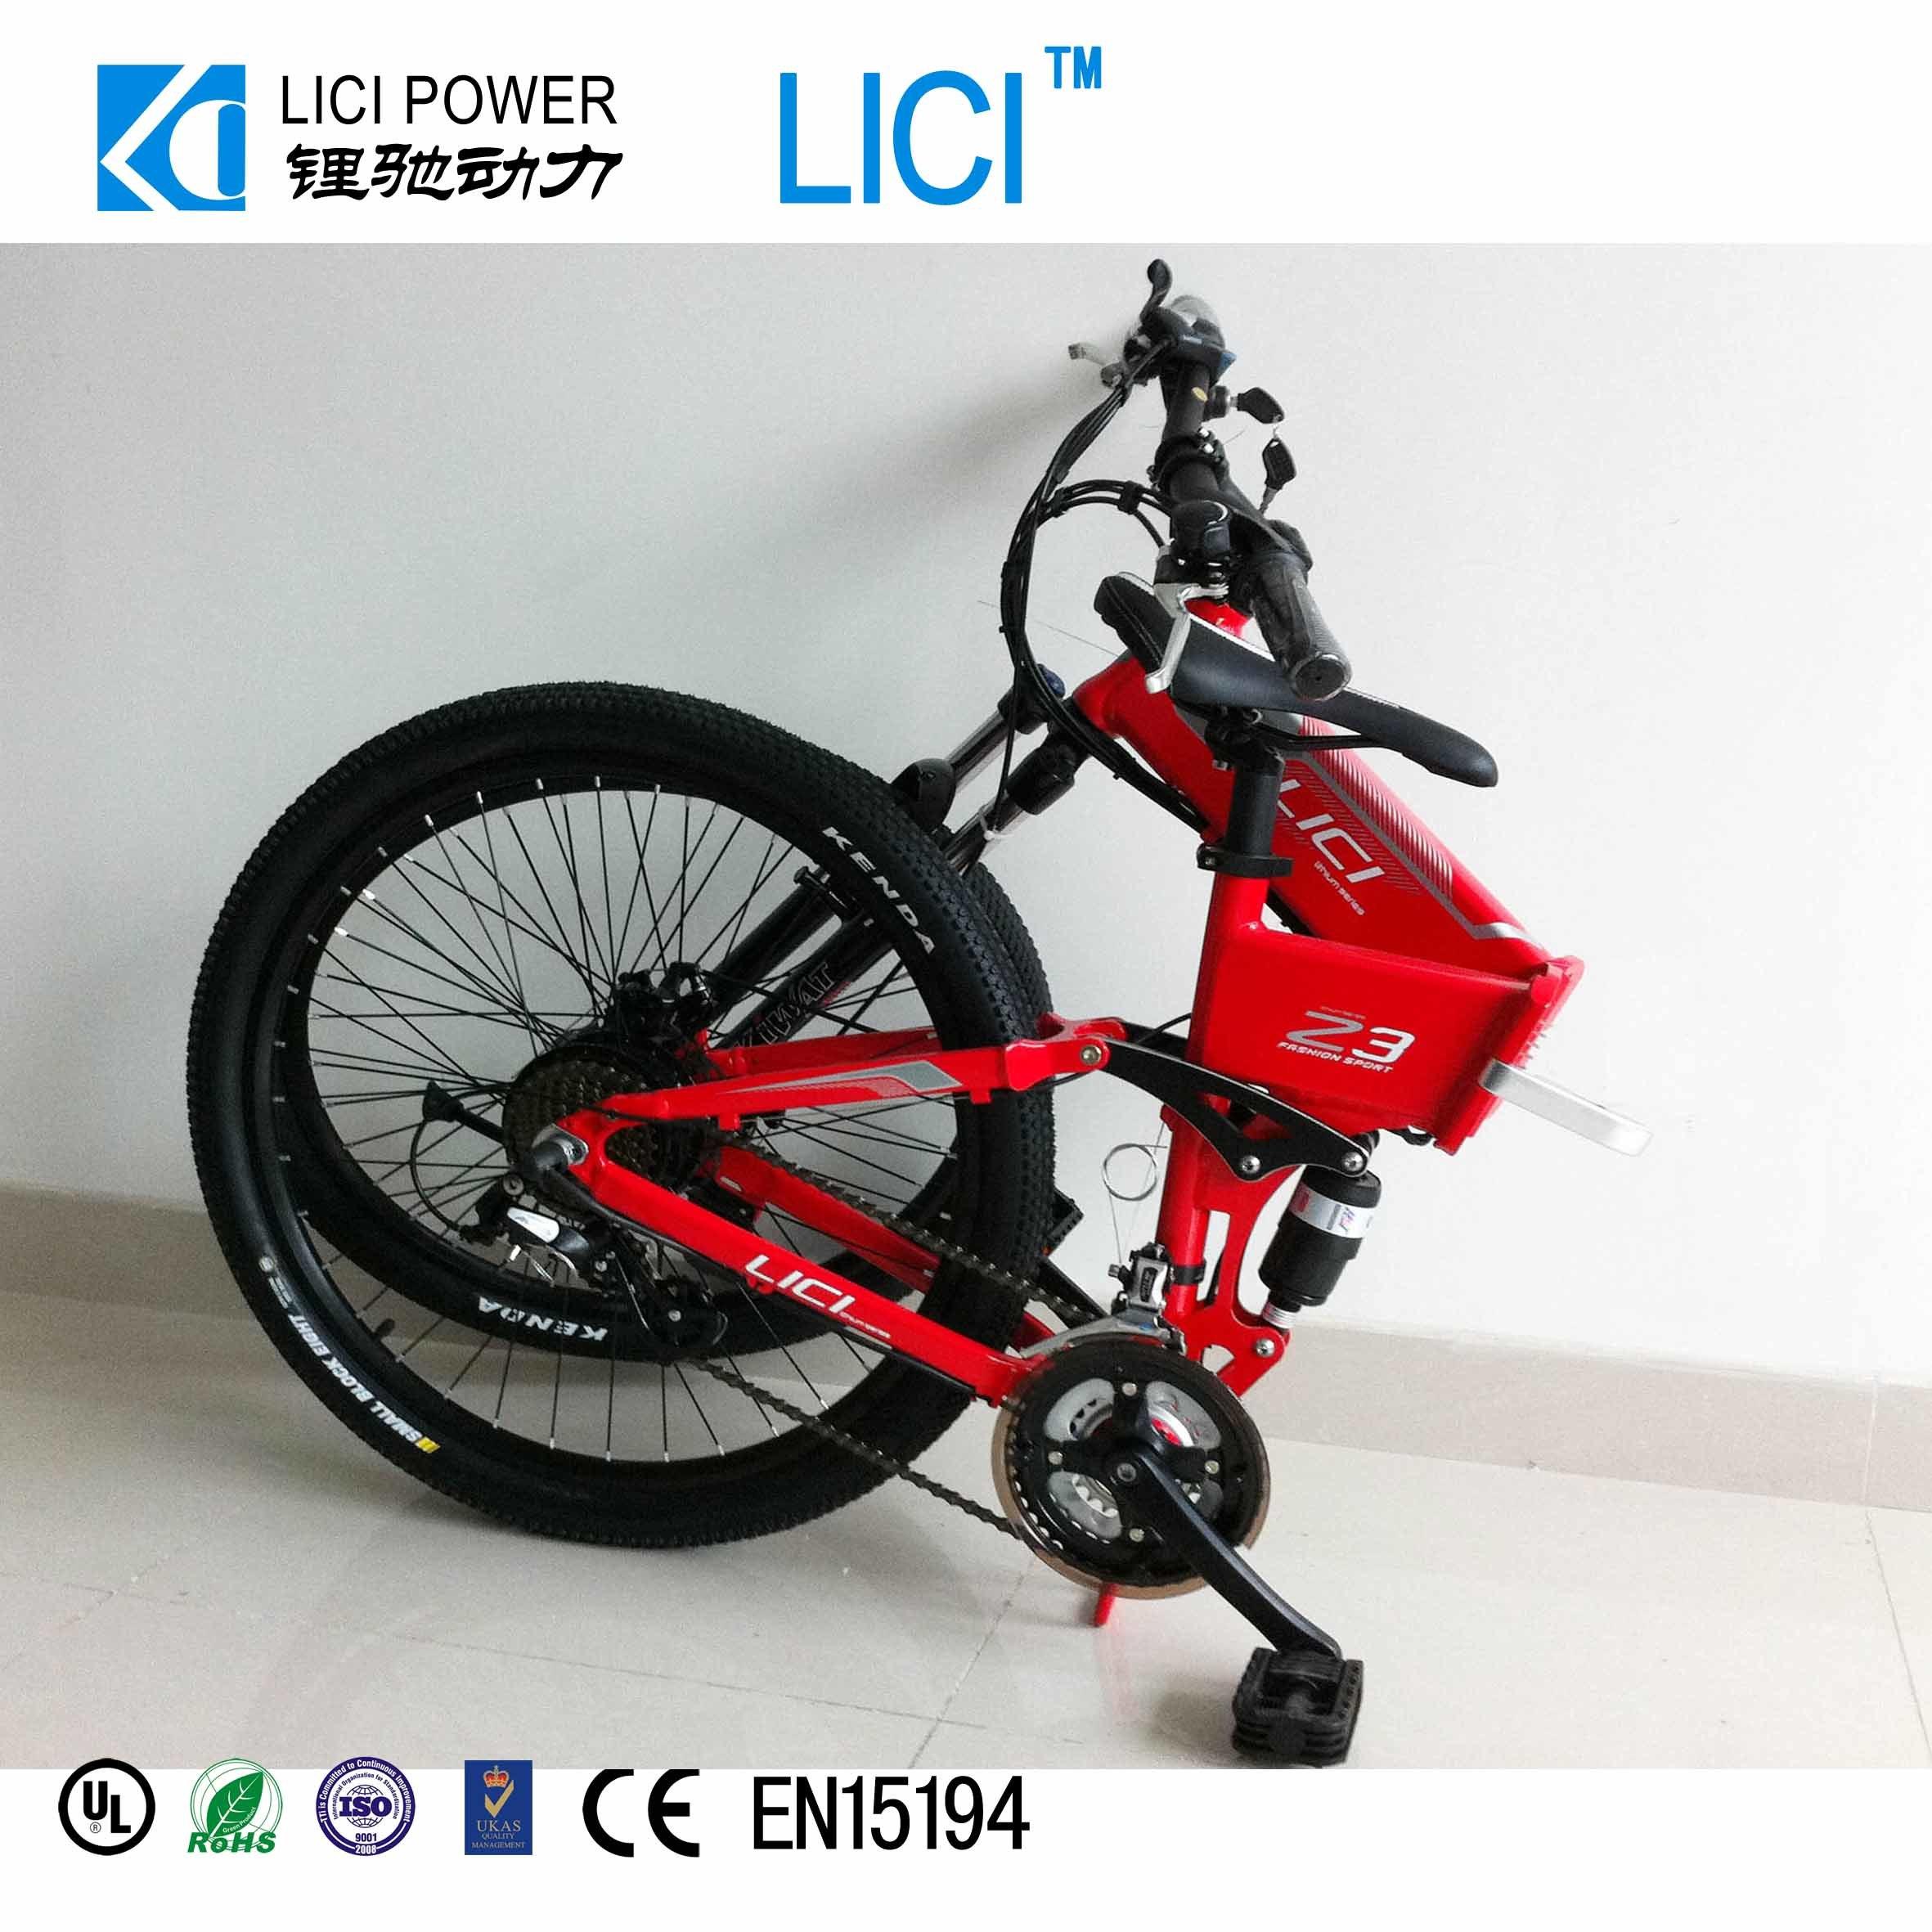 2362 x 2362 · 272 kB · jpeg, 2013 bicicletas eléctricas plegables